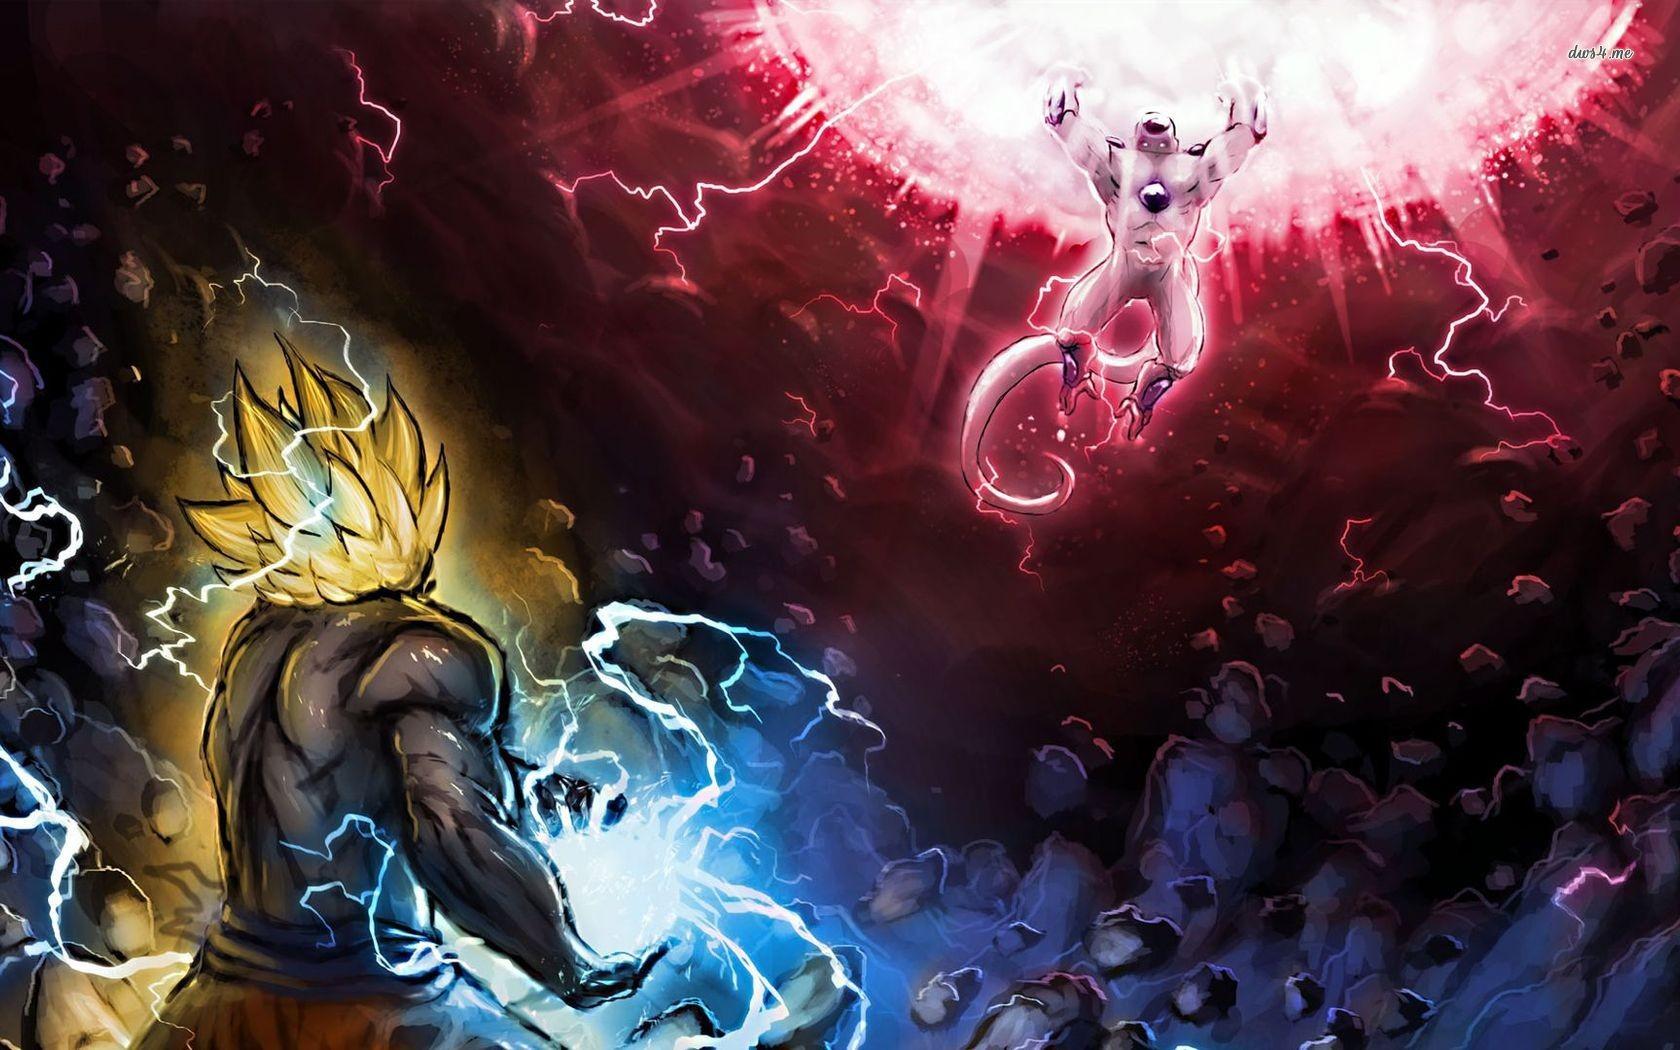 Epic Dbz Wallpapers High Resolution: Wallpaper : Son Goku, Dragon Ball Z, Kamehameha, Frieza